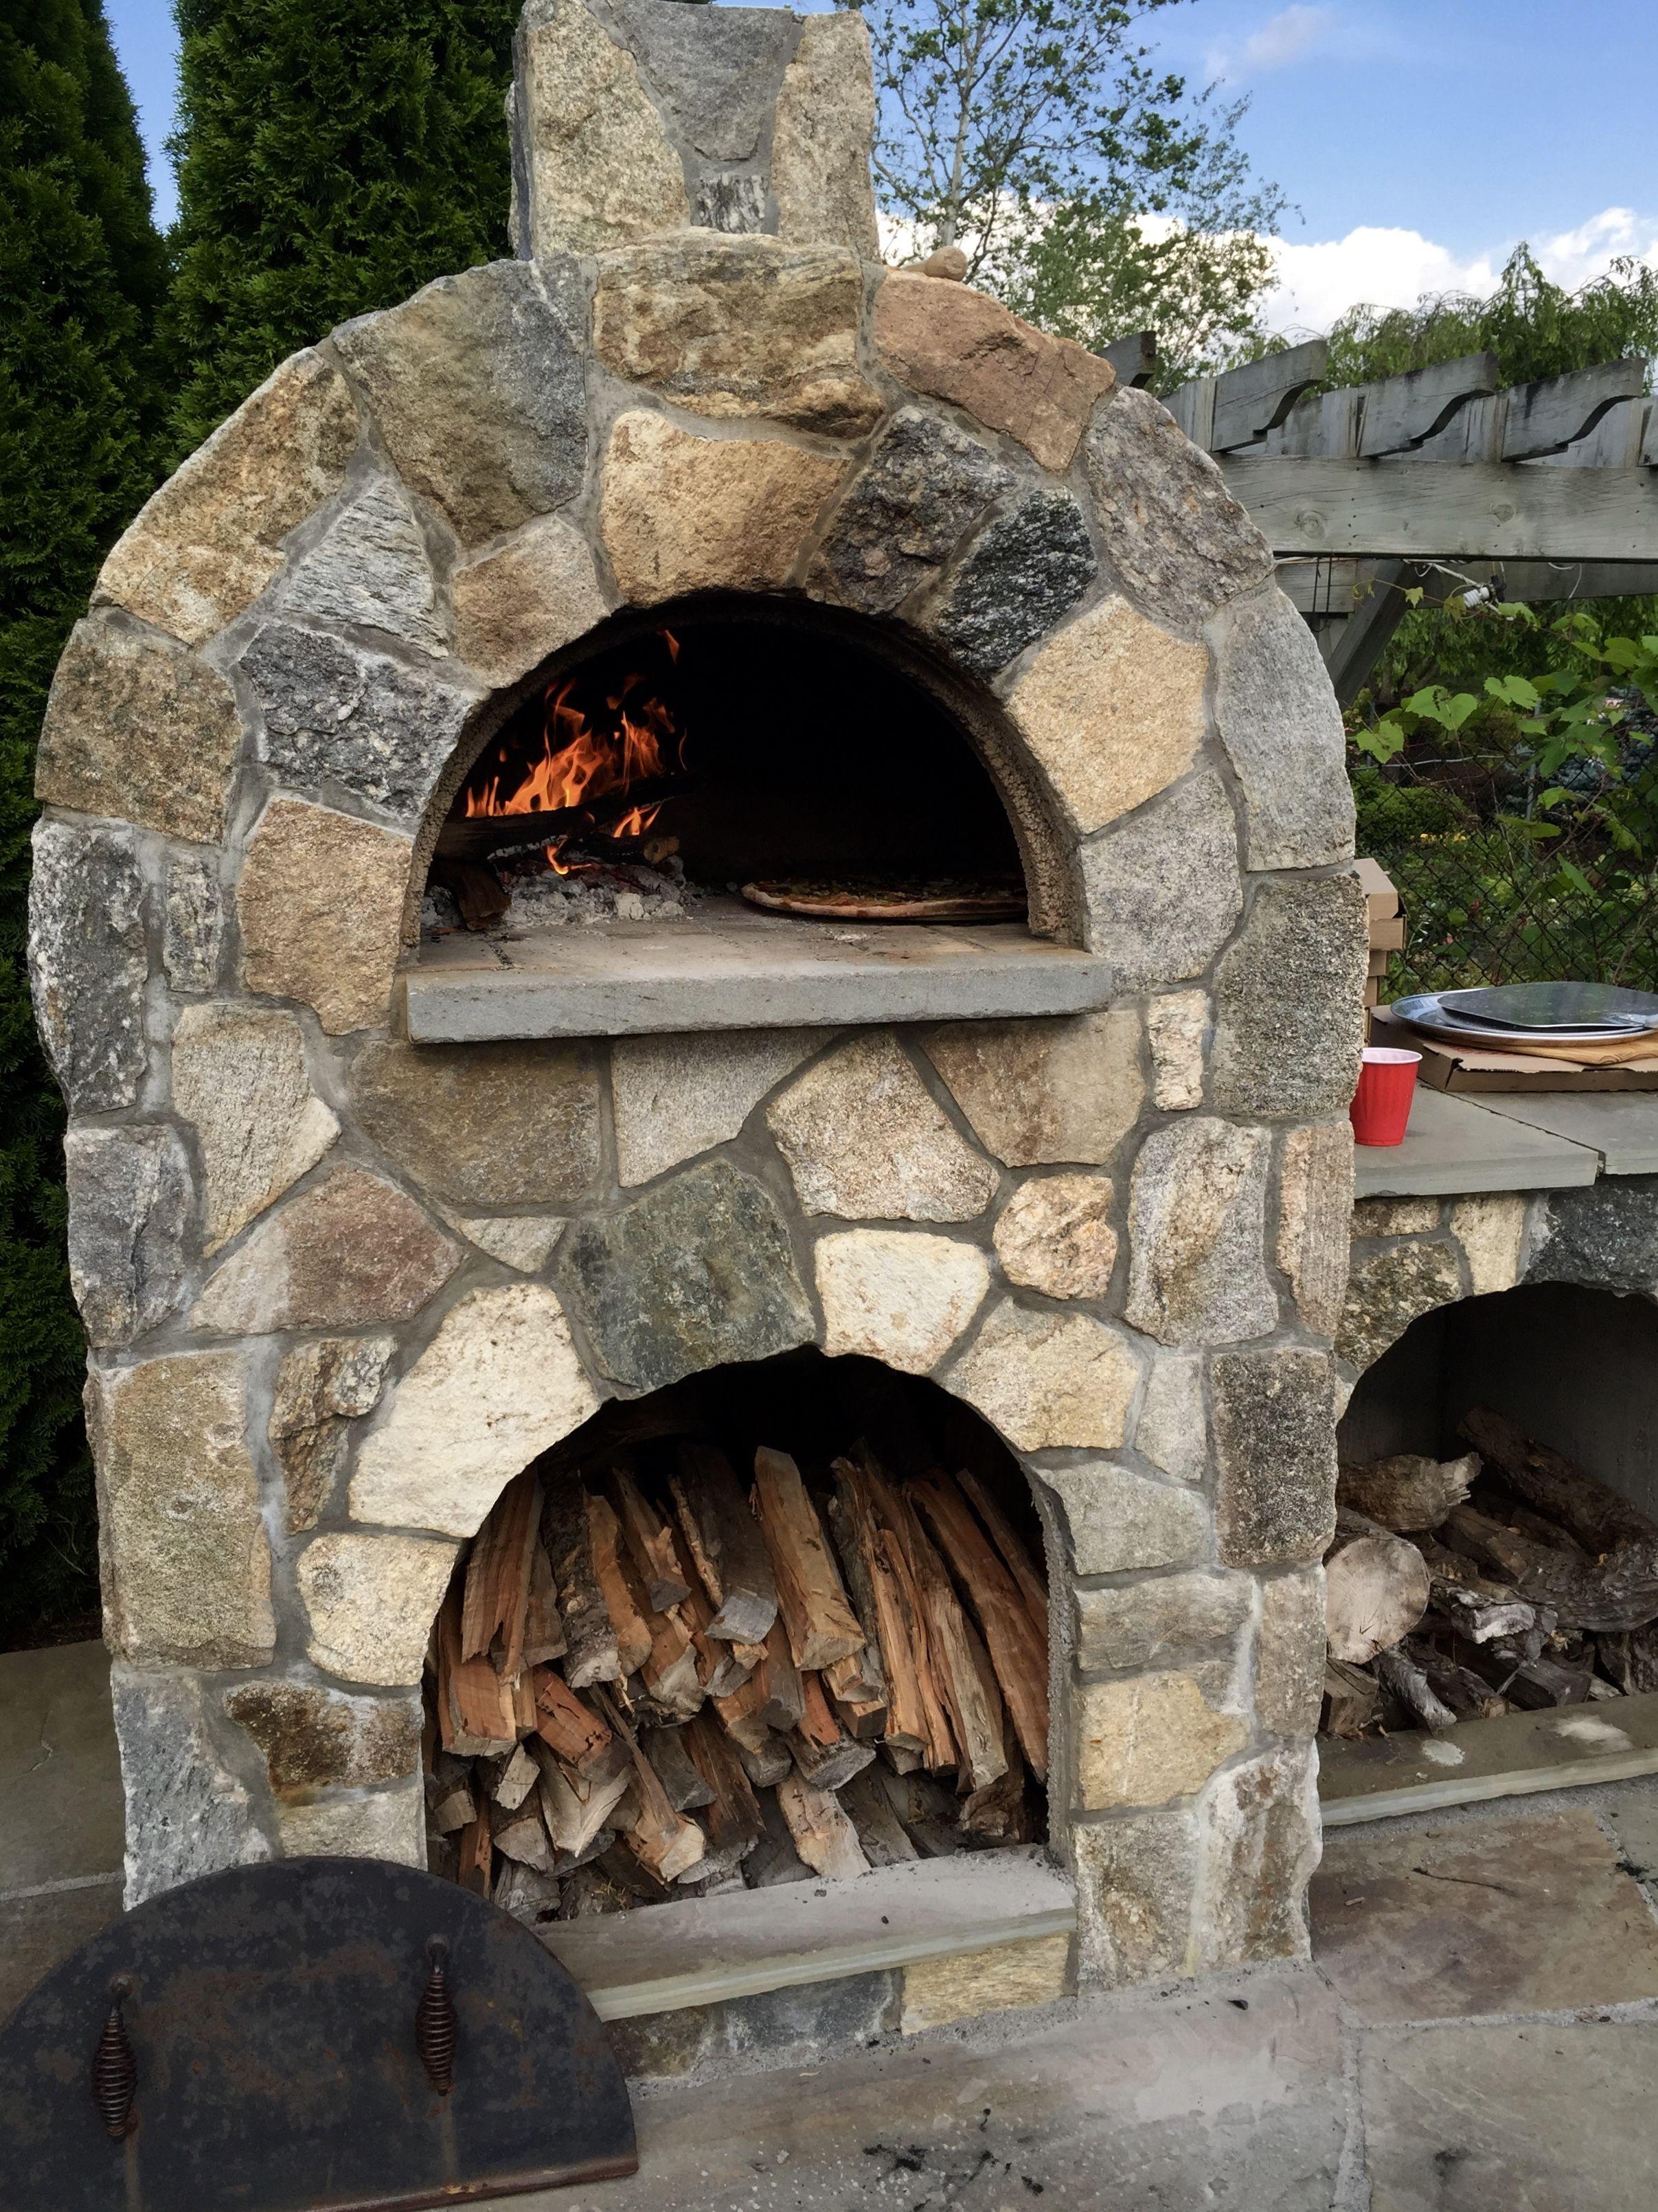 amerigo outdoor pizza oven with natural stone veneer pizza